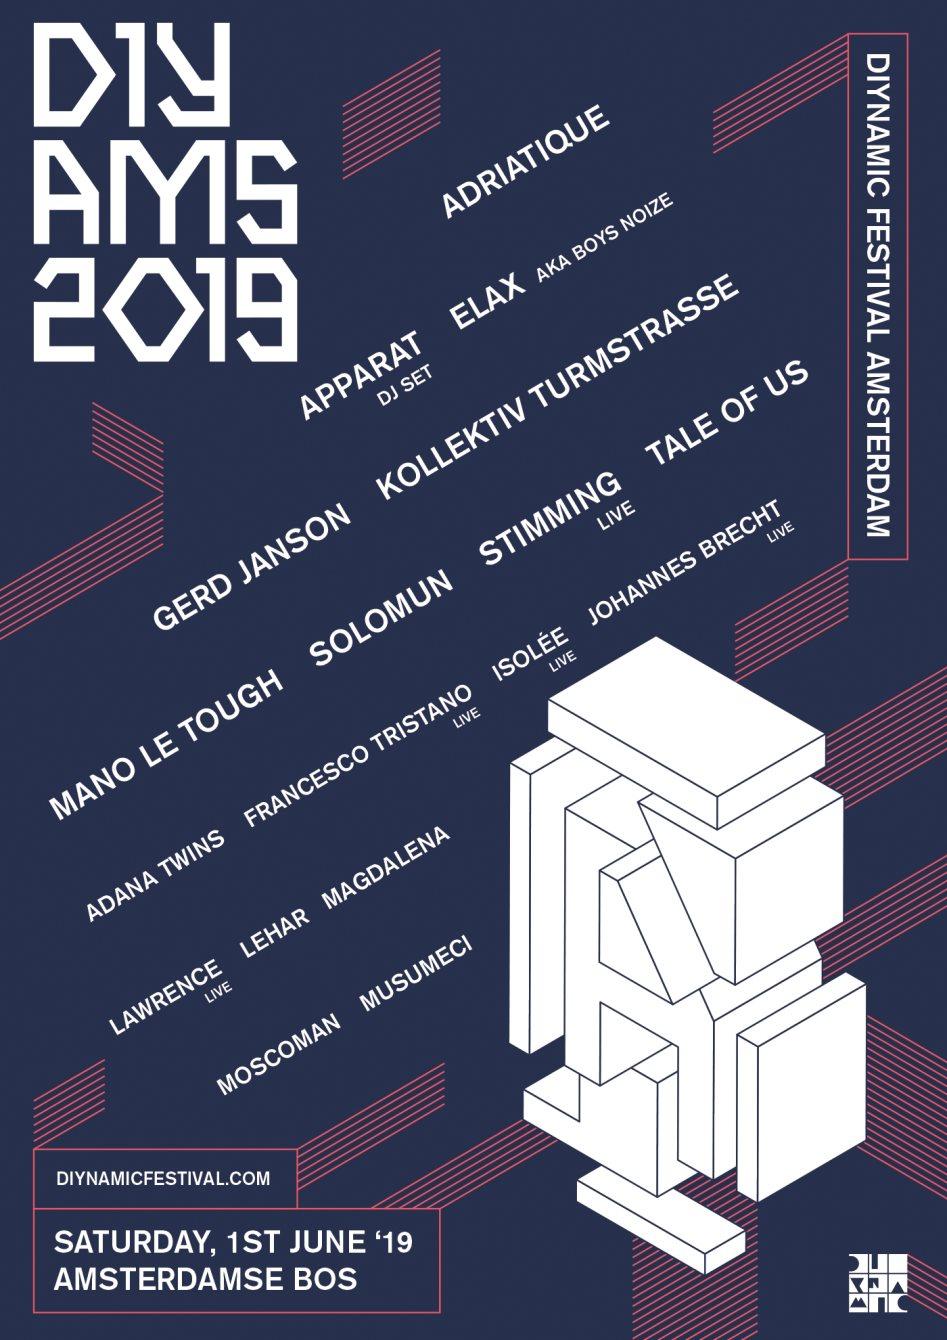 Diynamic Festival Amsterdam 2019 - Flyer front